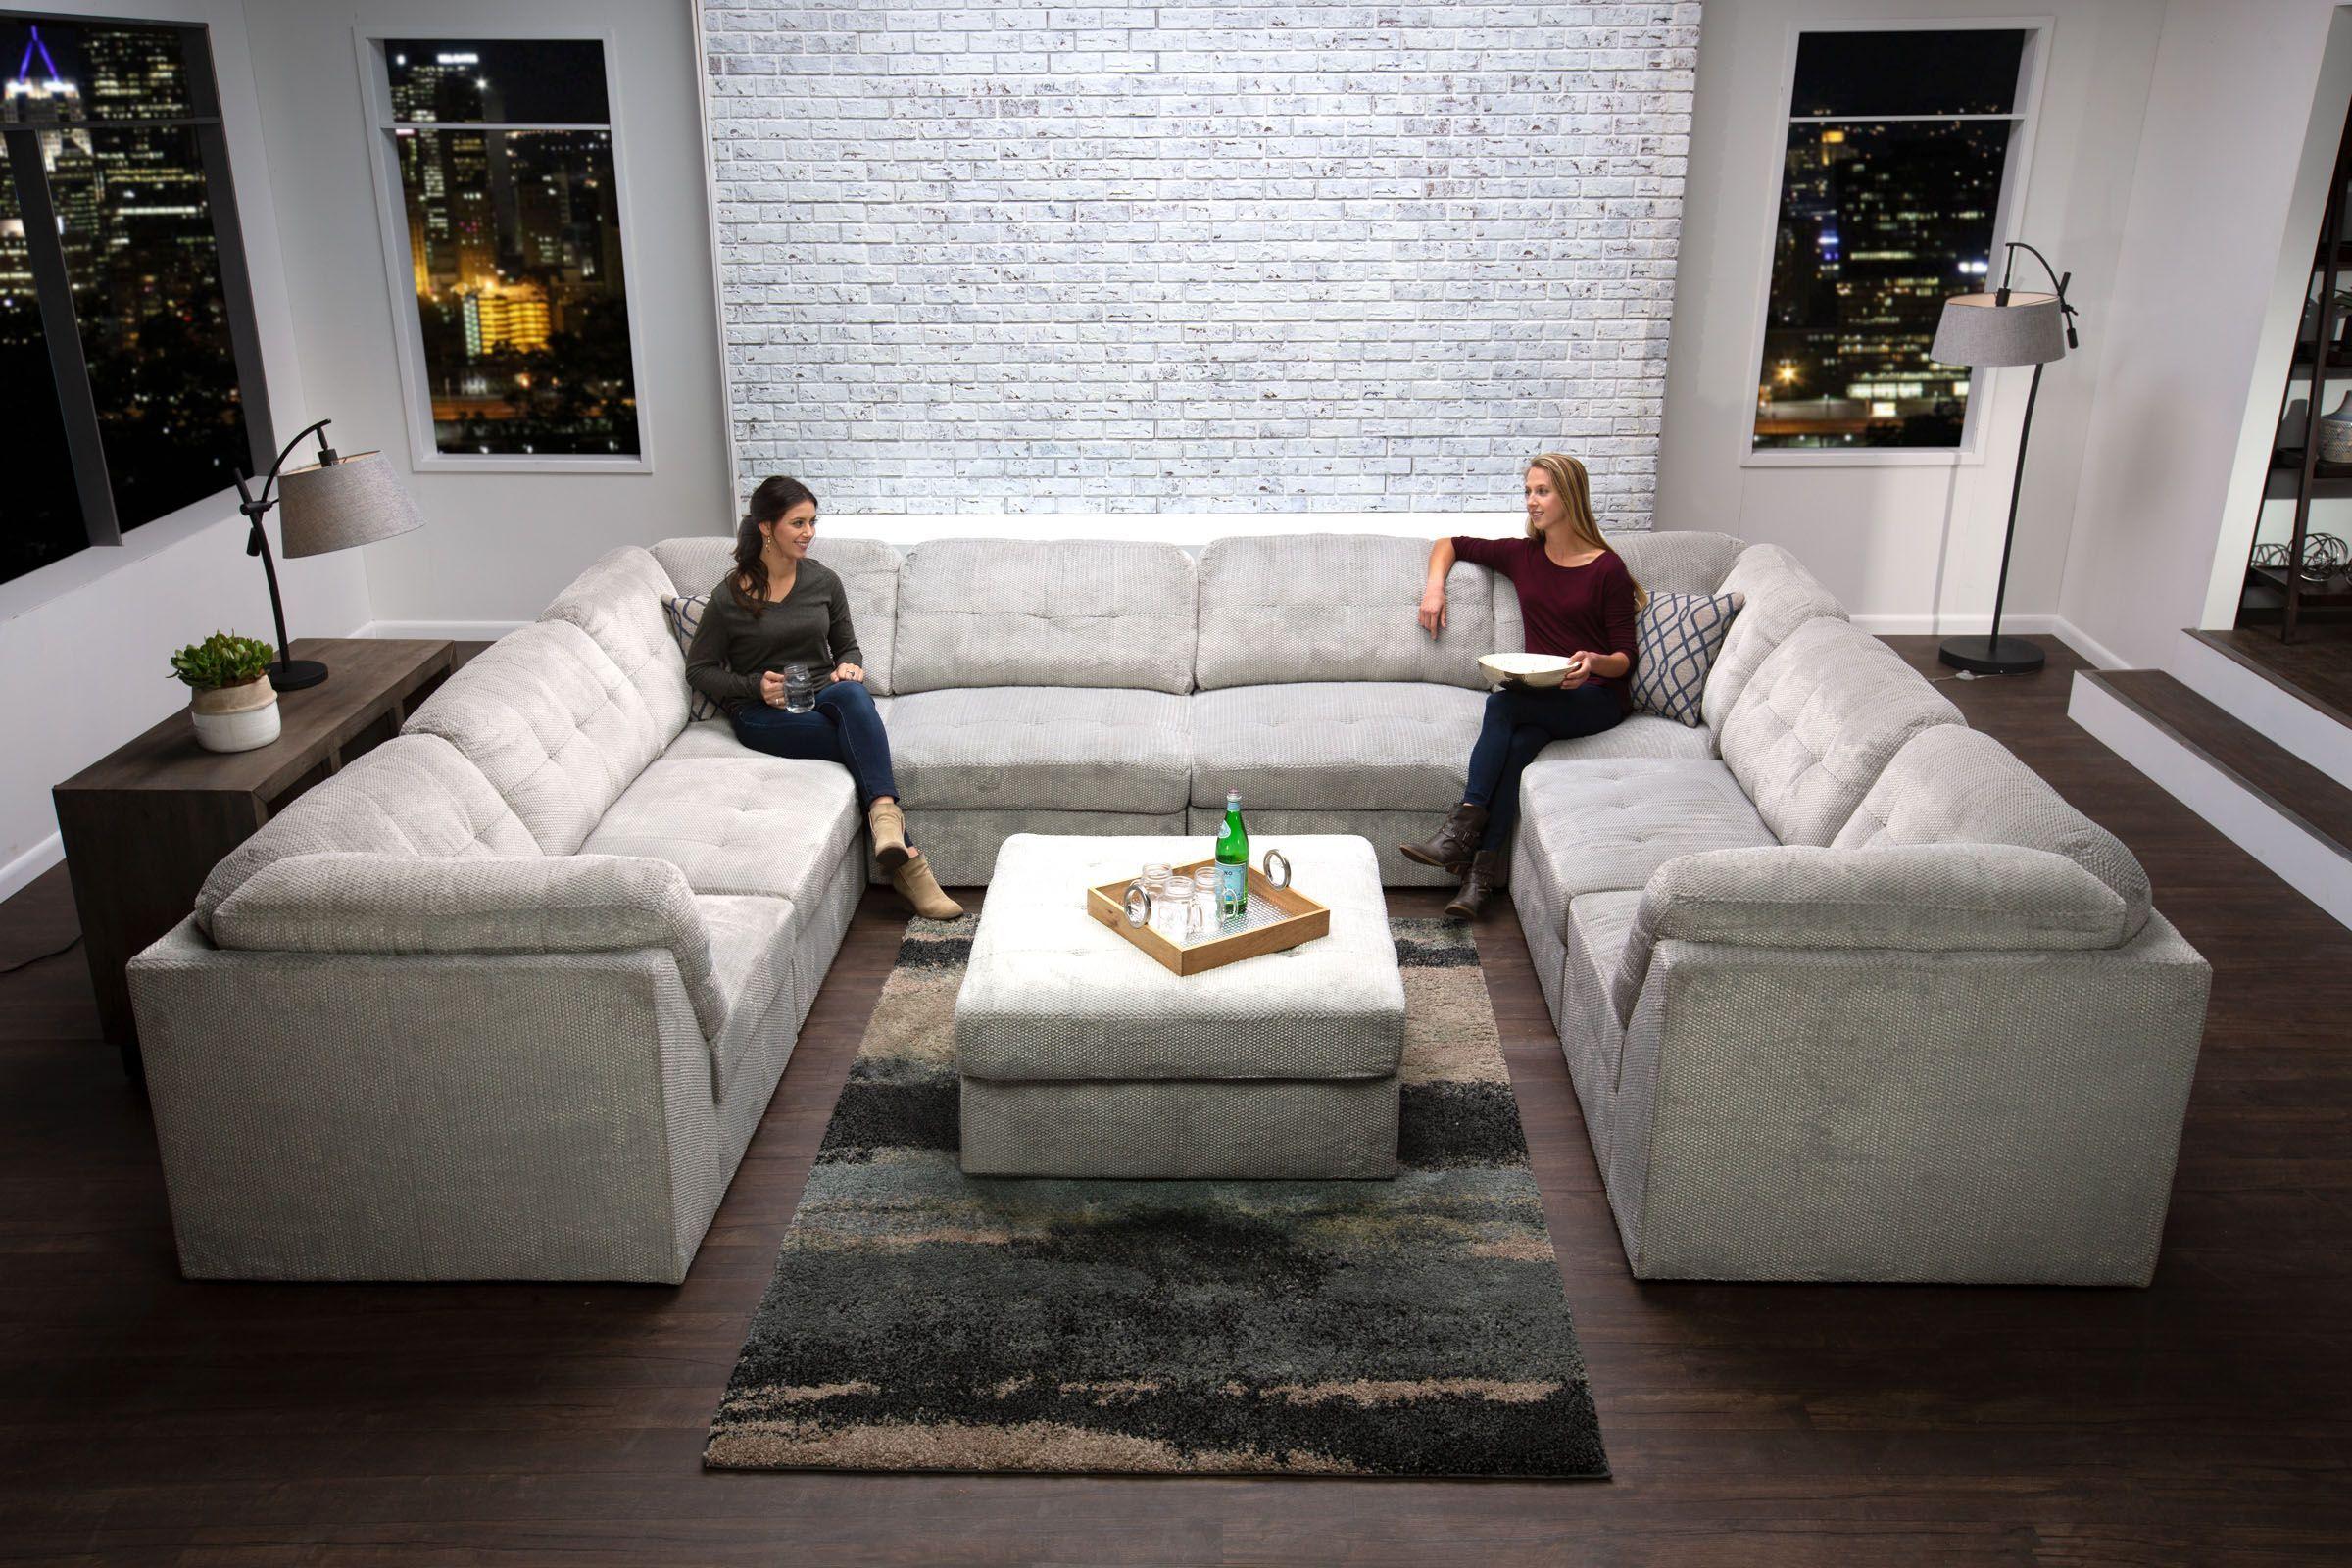 Tremendous Granada 8 Piece Sectional Ottoman Products In 2019 Customarchery Wood Chair Design Ideas Customarcherynet